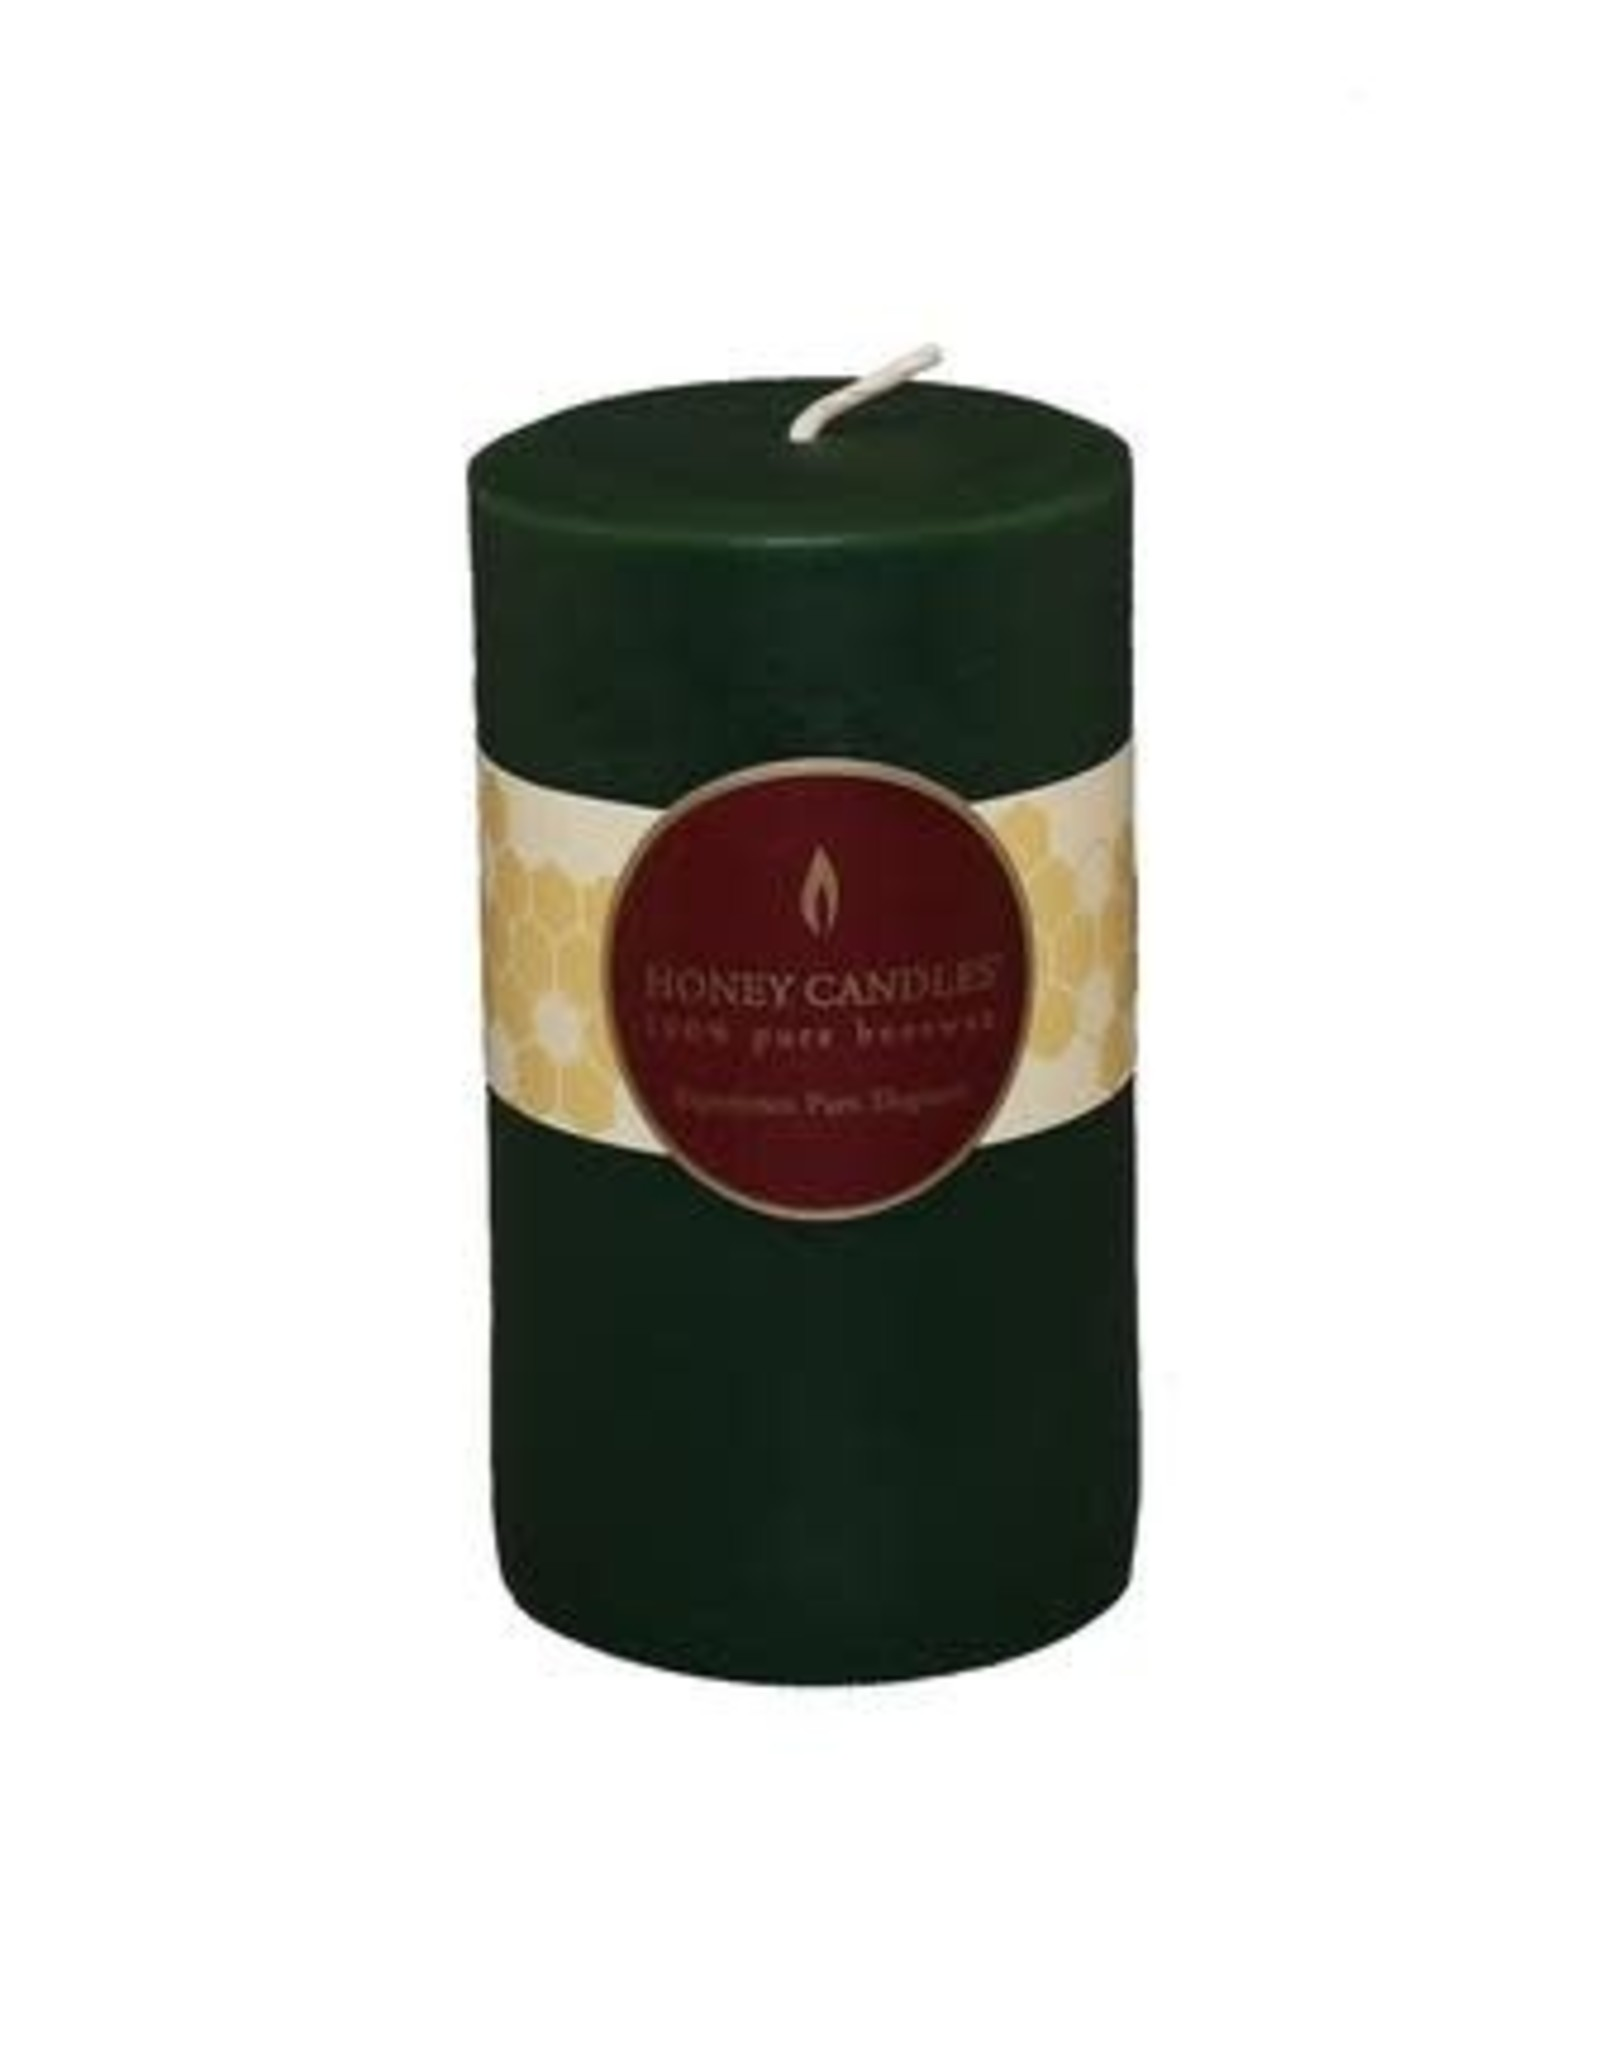 "Honey Candles Honey Candles 5"" Round Pillar- Forest Green"